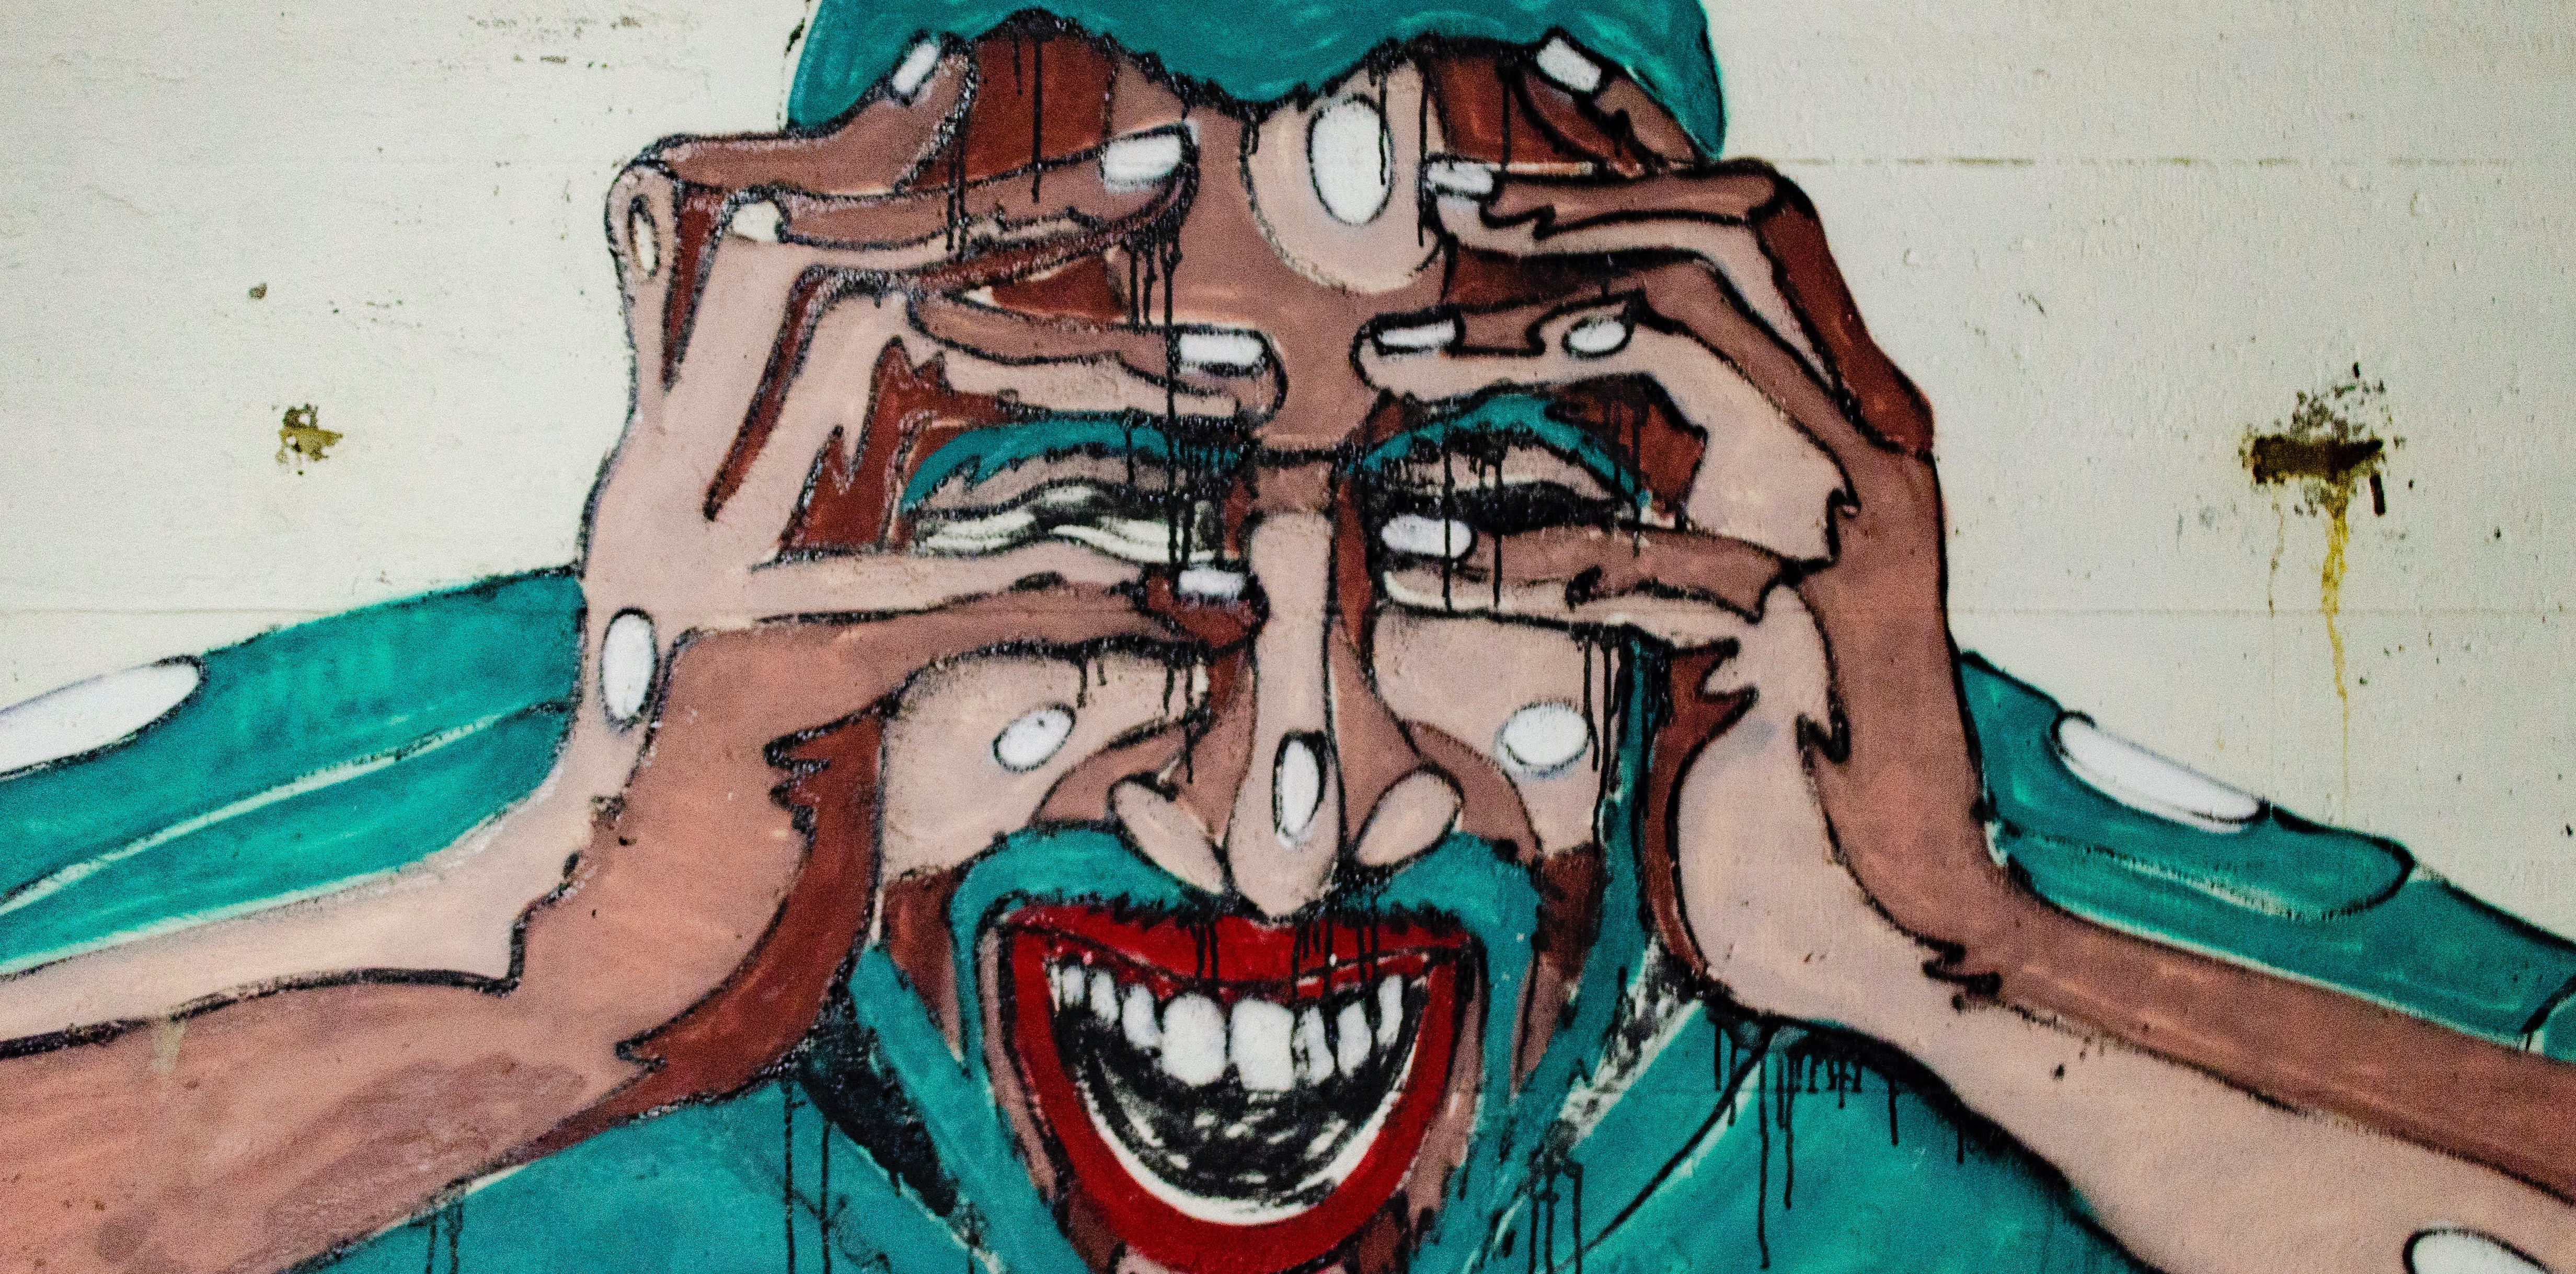 graffiti man holding his head in pain